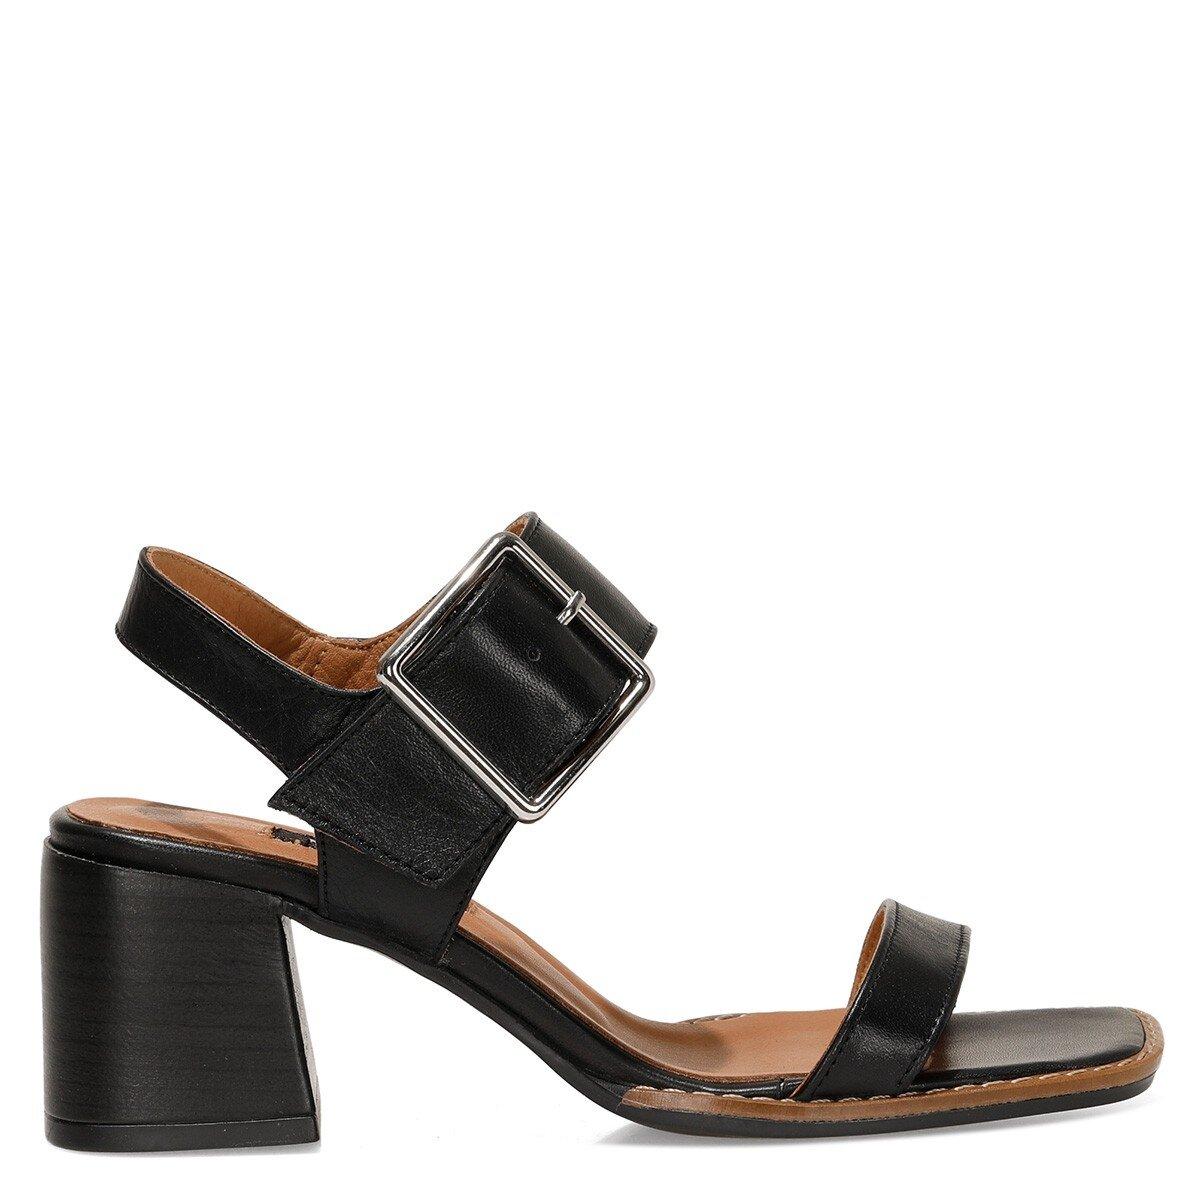 SUMMEL 1FX Siyah Kadın Topuklu Sandalet